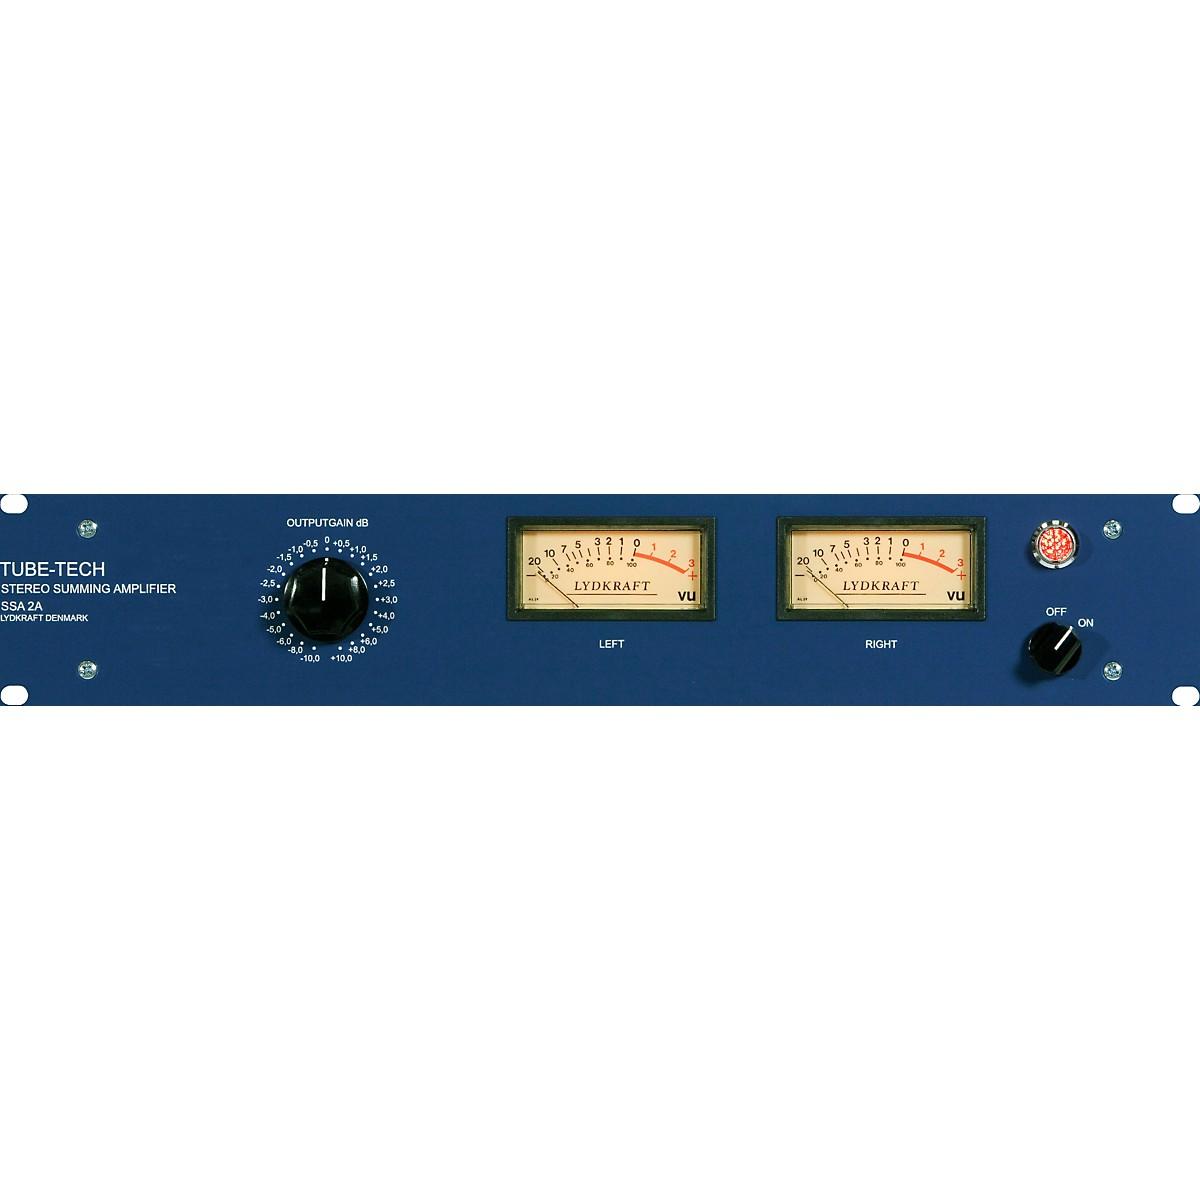 Tube-Tech SSA-2B Stereo Summing Amplifier